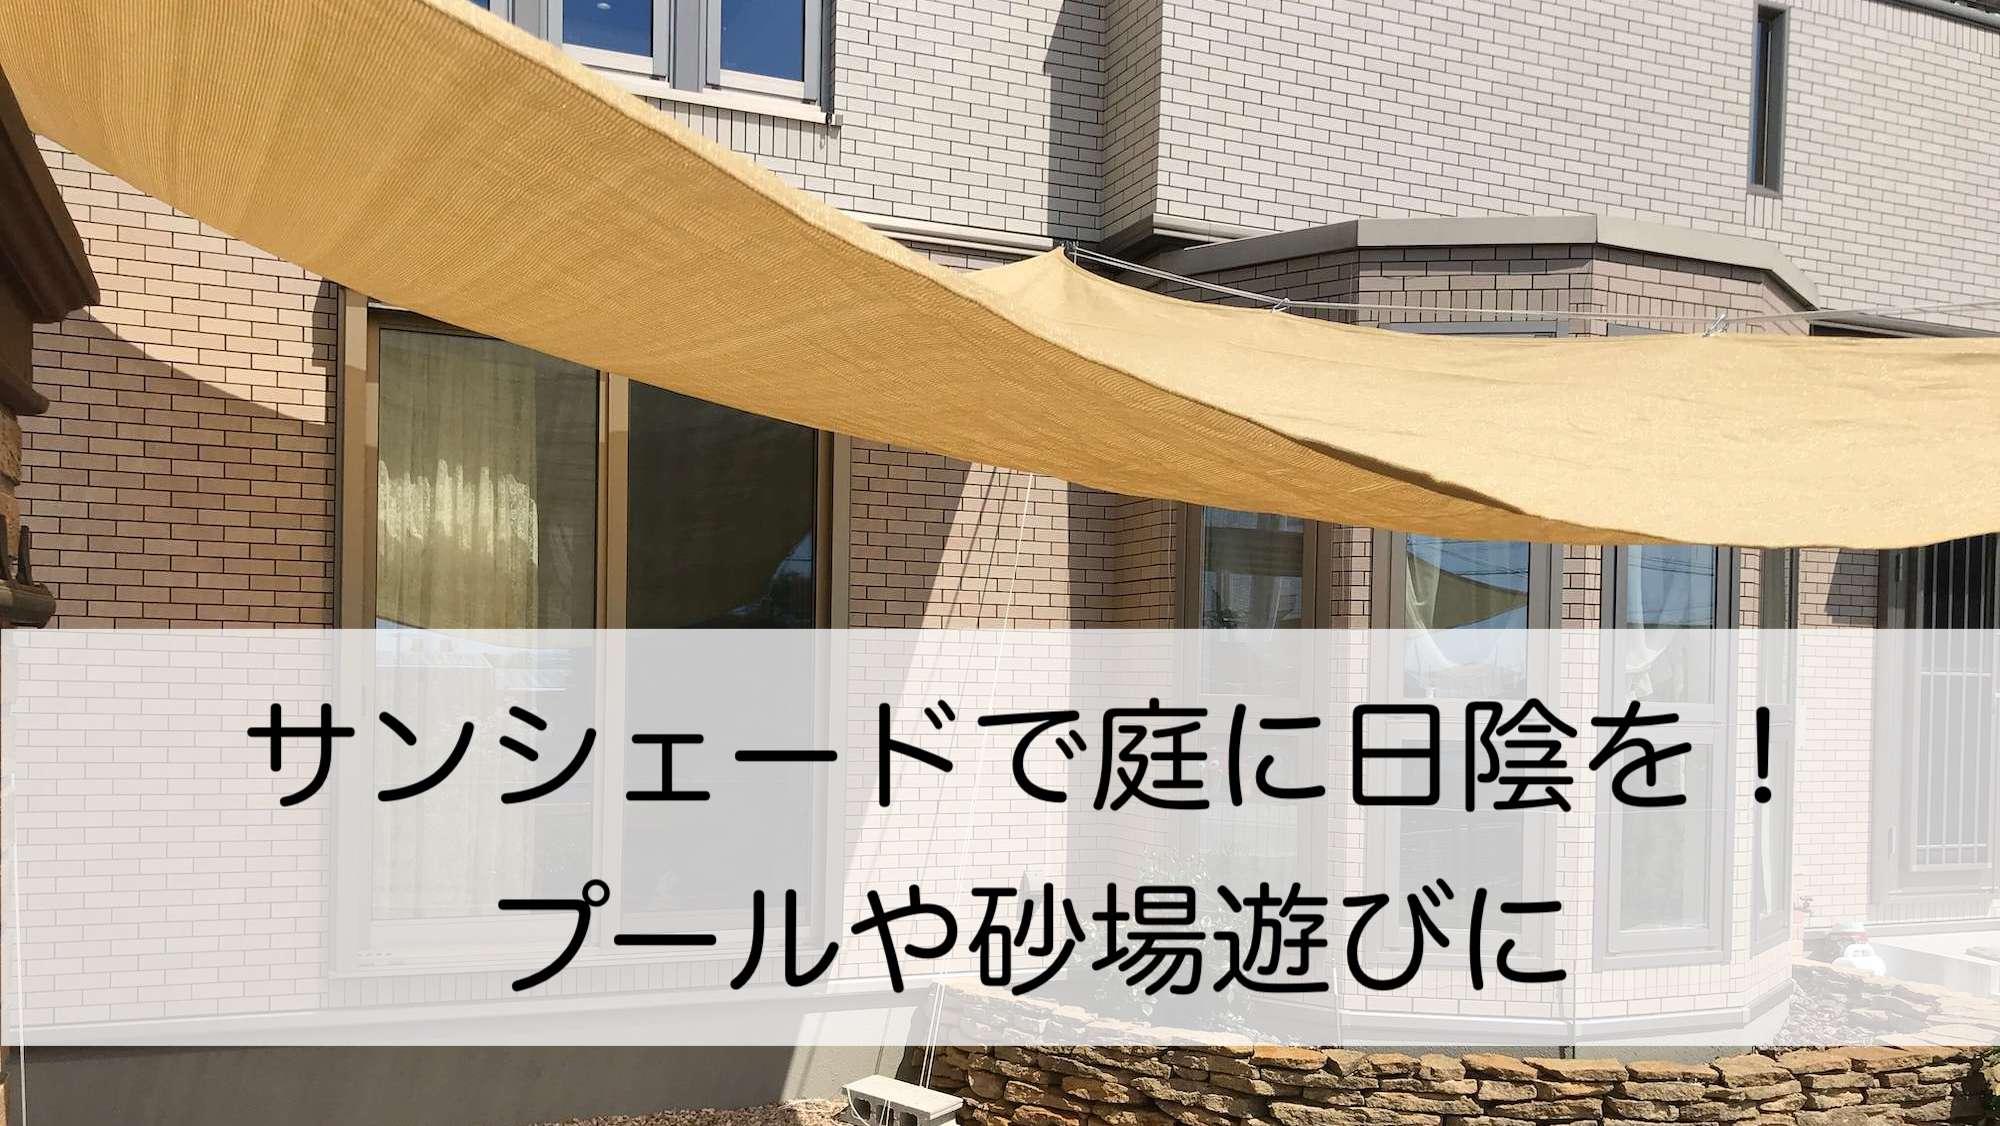 "<span class=""title"">サンシェード(タープ)で庭に日陰を!プールや砂遊びに</span>"